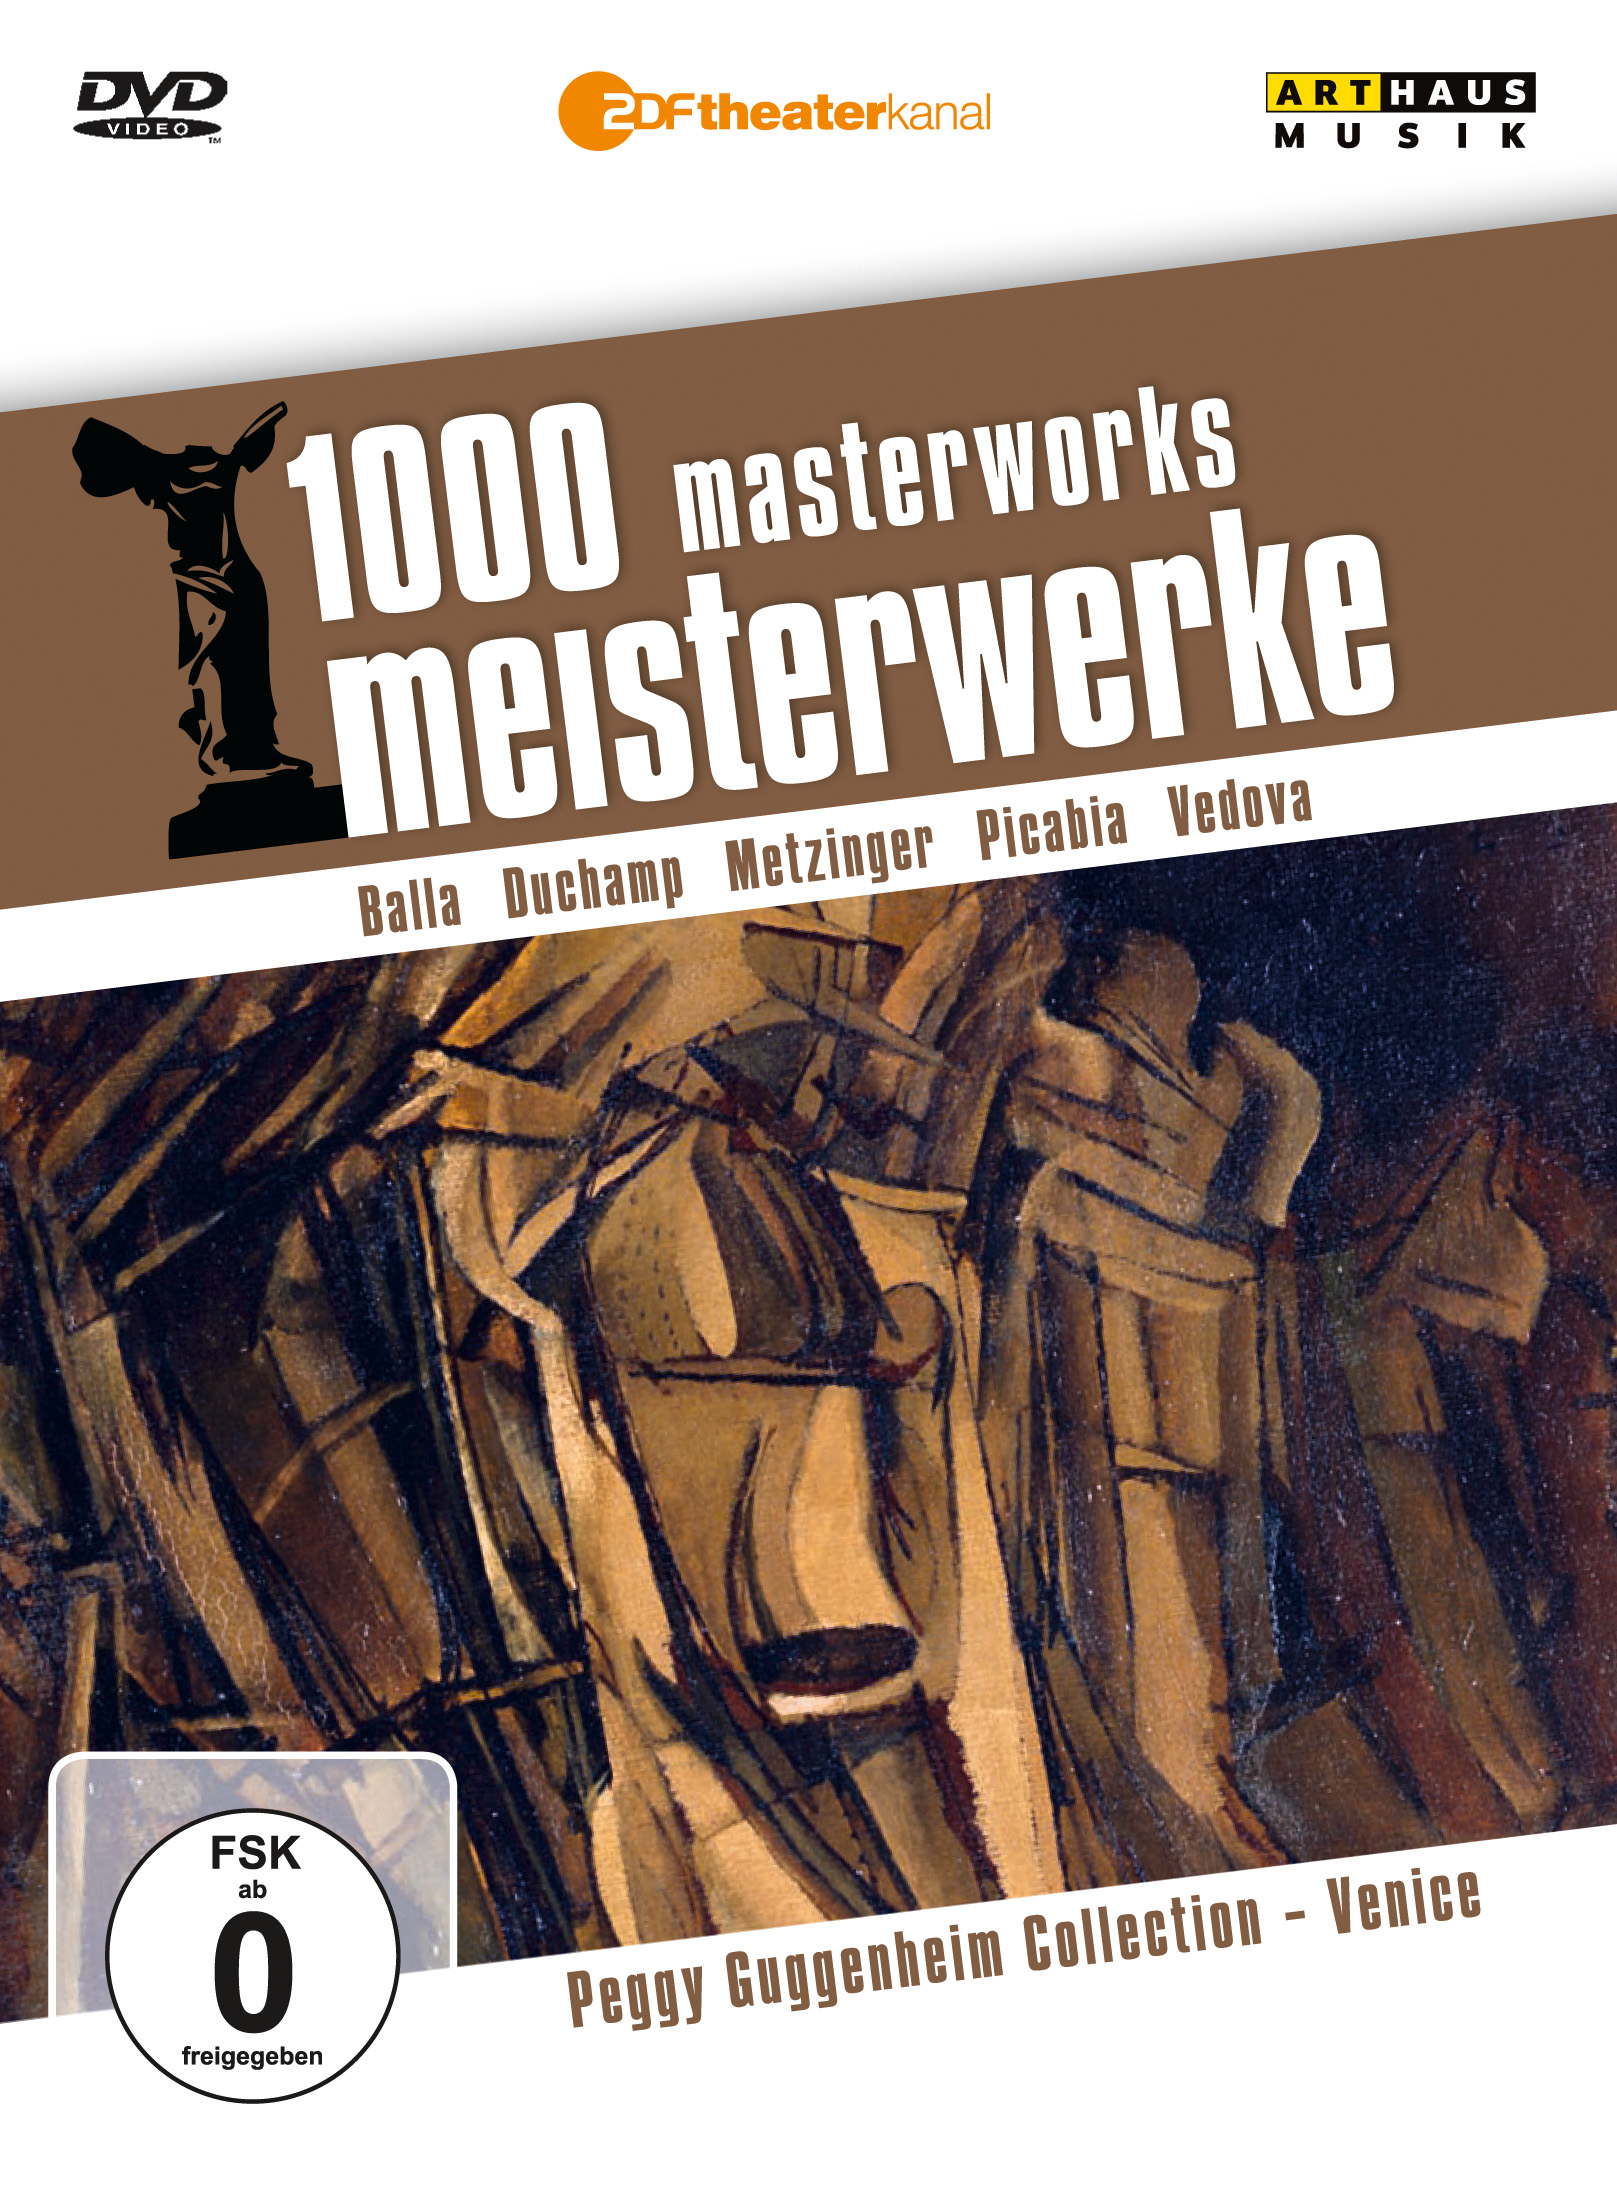 1000 Masterworks: Peggy Guggenheim Collection - Venice